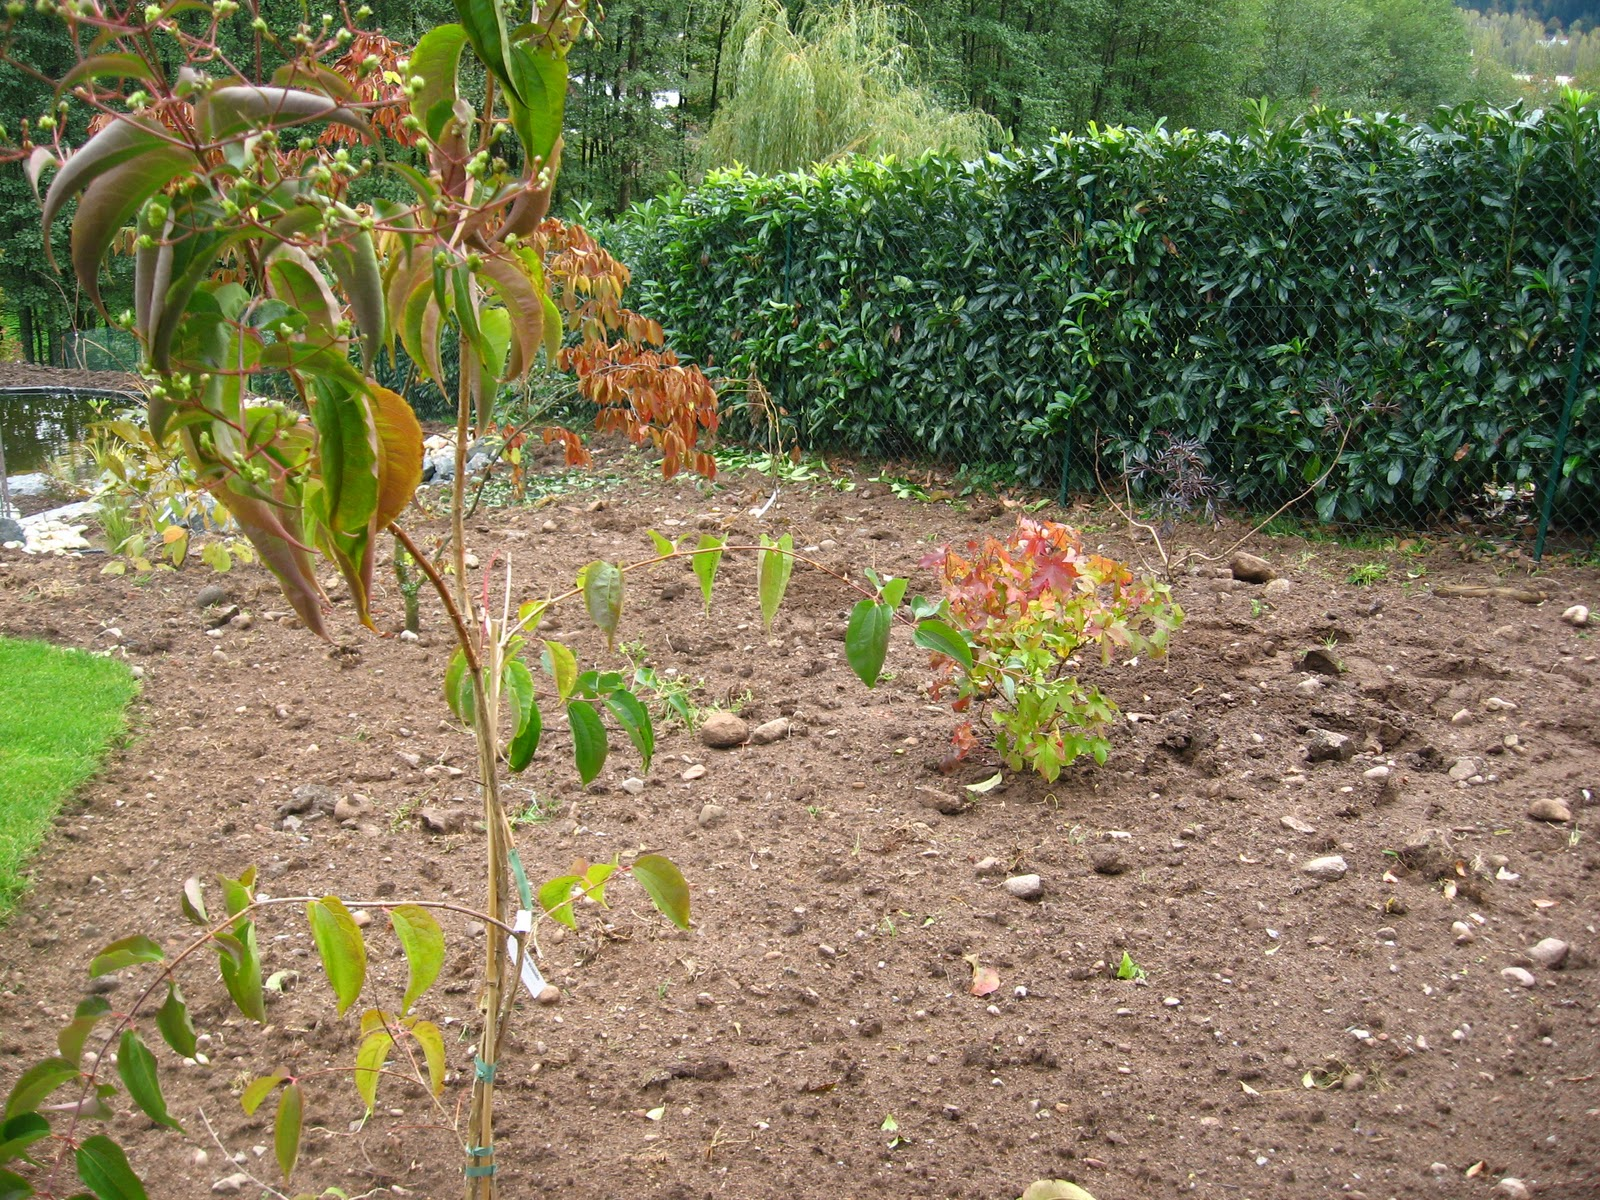 Le jardin du bois des dames semaine plantation for Jardin plantation